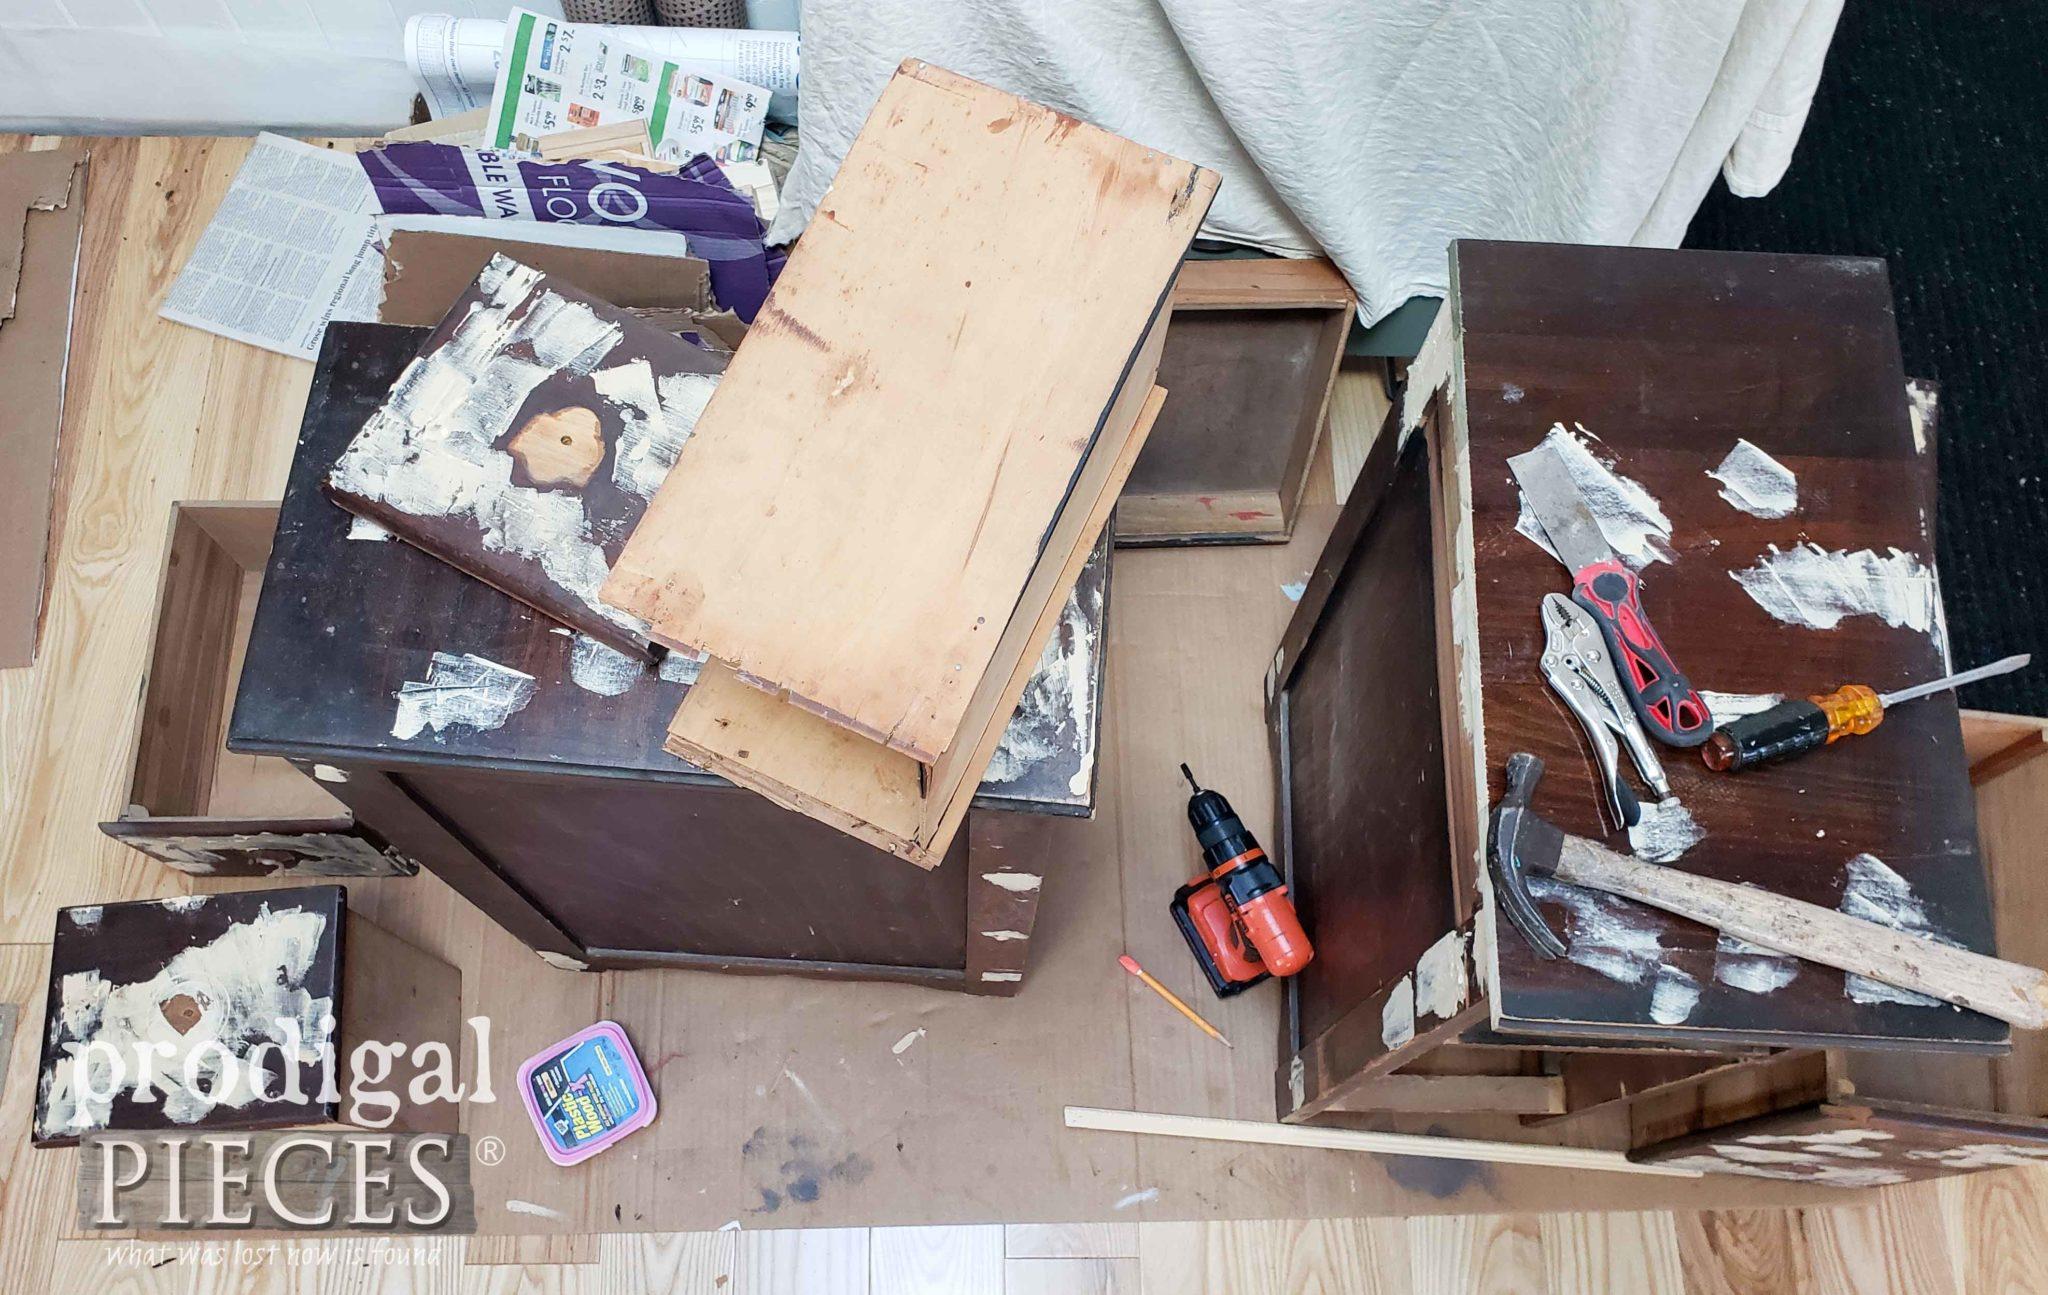 Hot Mess of a Desk by Prodigal Pieces | prodigalpieces.com